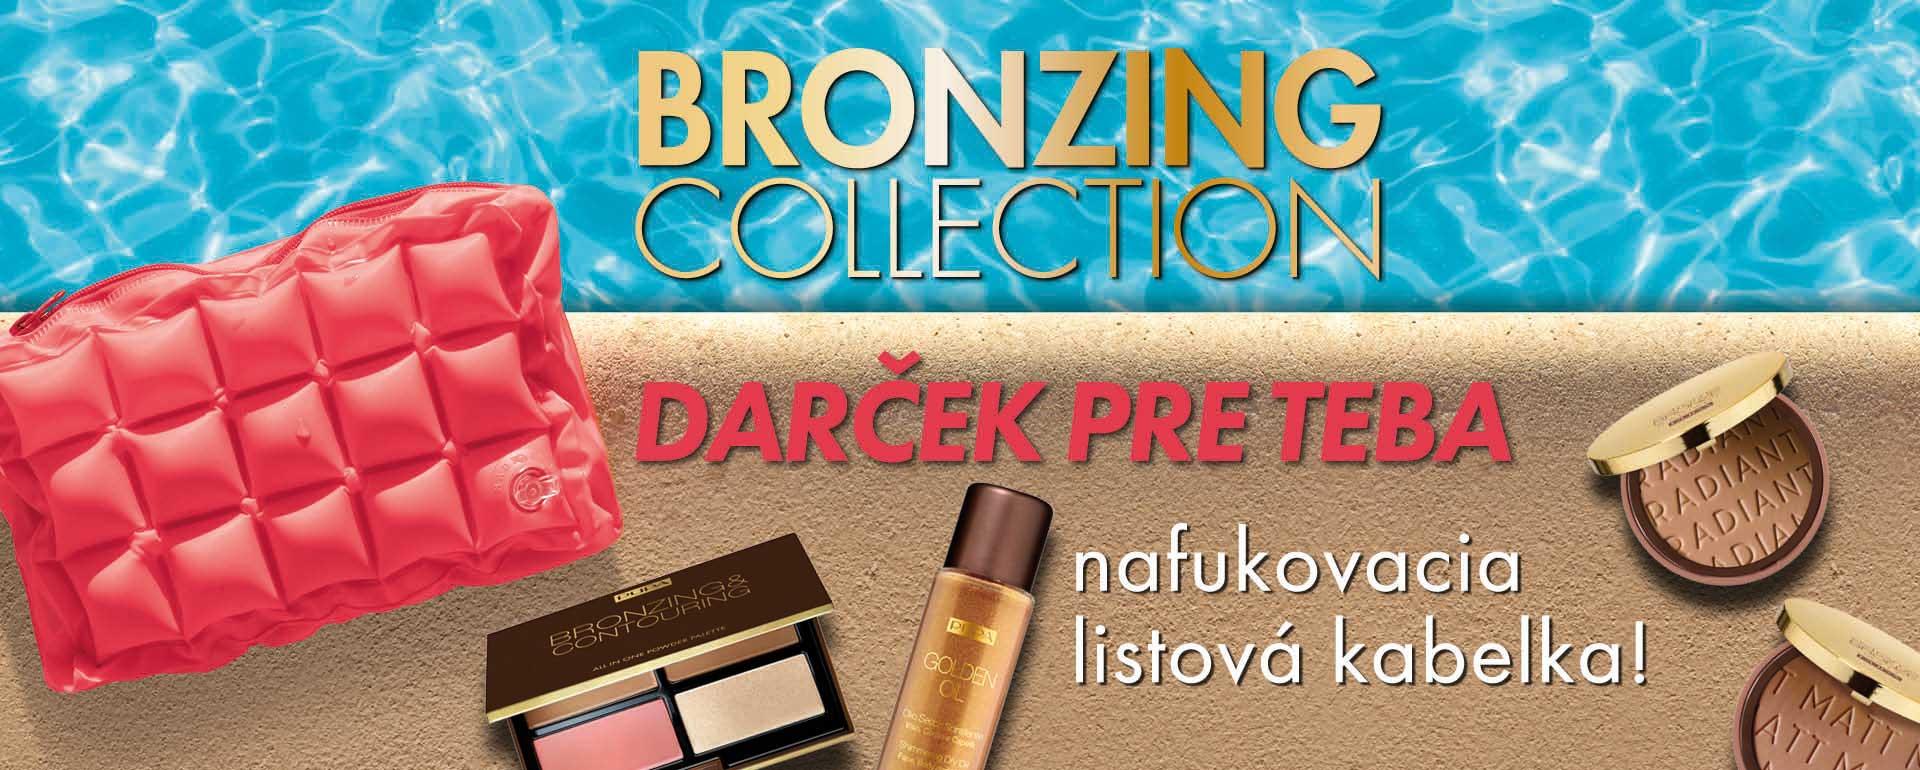 Promo Bronzing Collection